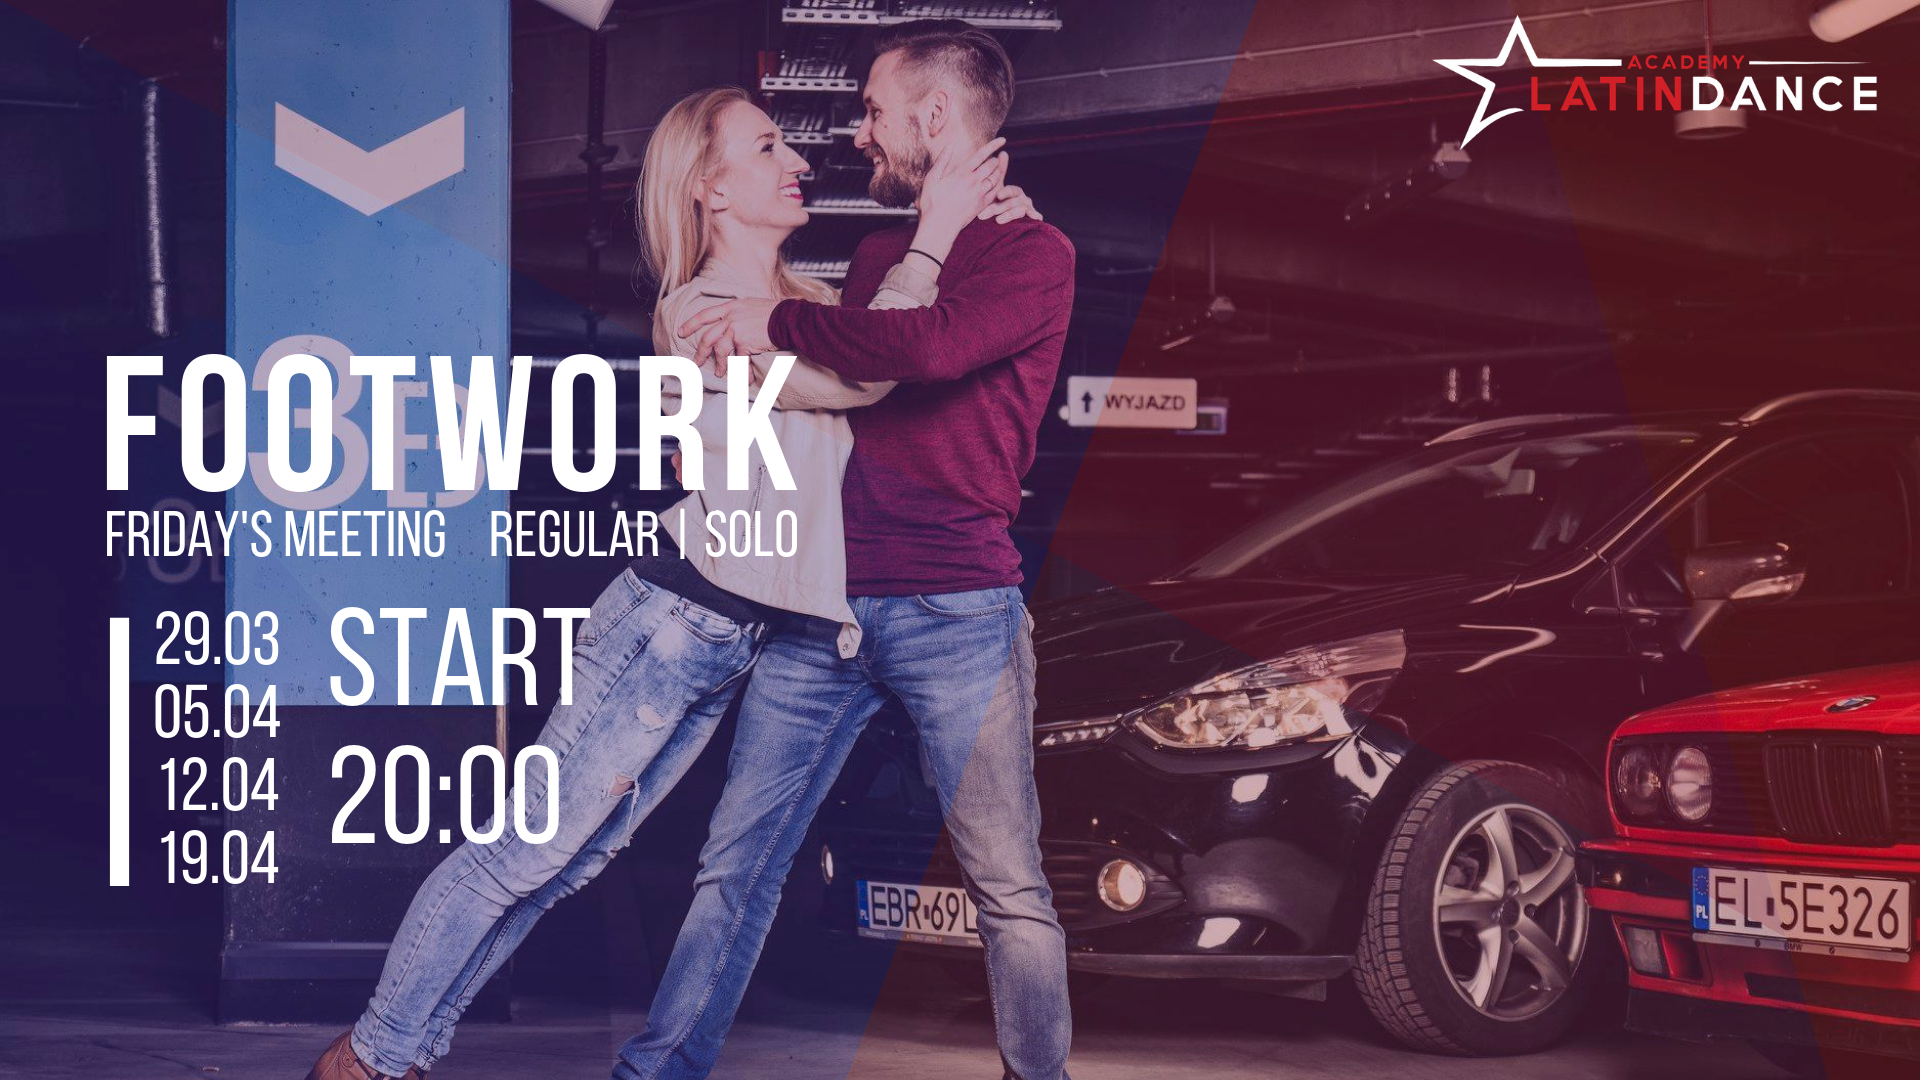 Footwork Friday's Meeting z Marcinem i Magdą!